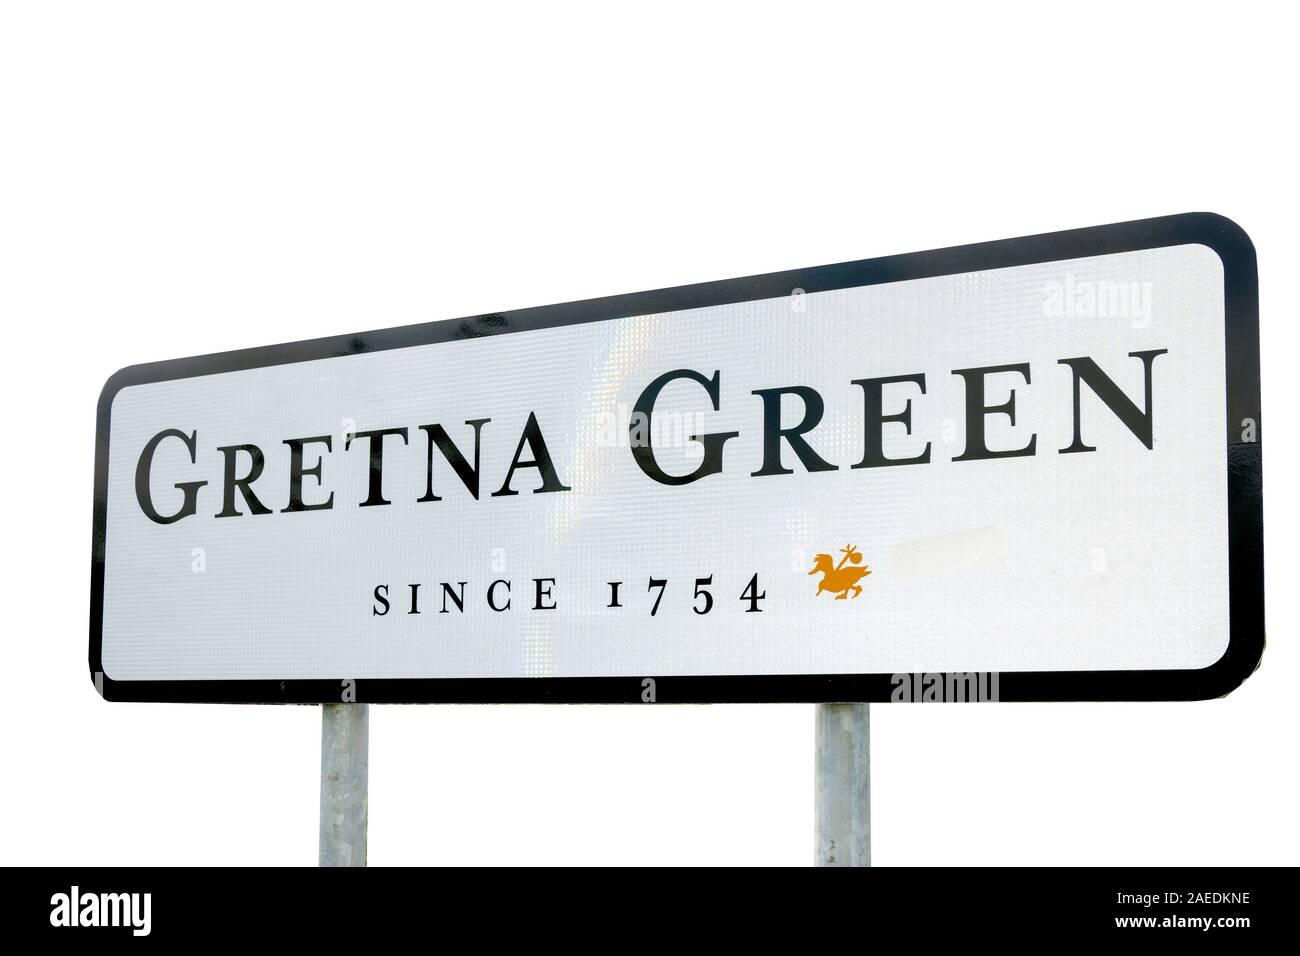 Entrance sign, Gretna Green, Gretna, Dumfries and Galloway, Scotland, United Kingdom Stock Photo